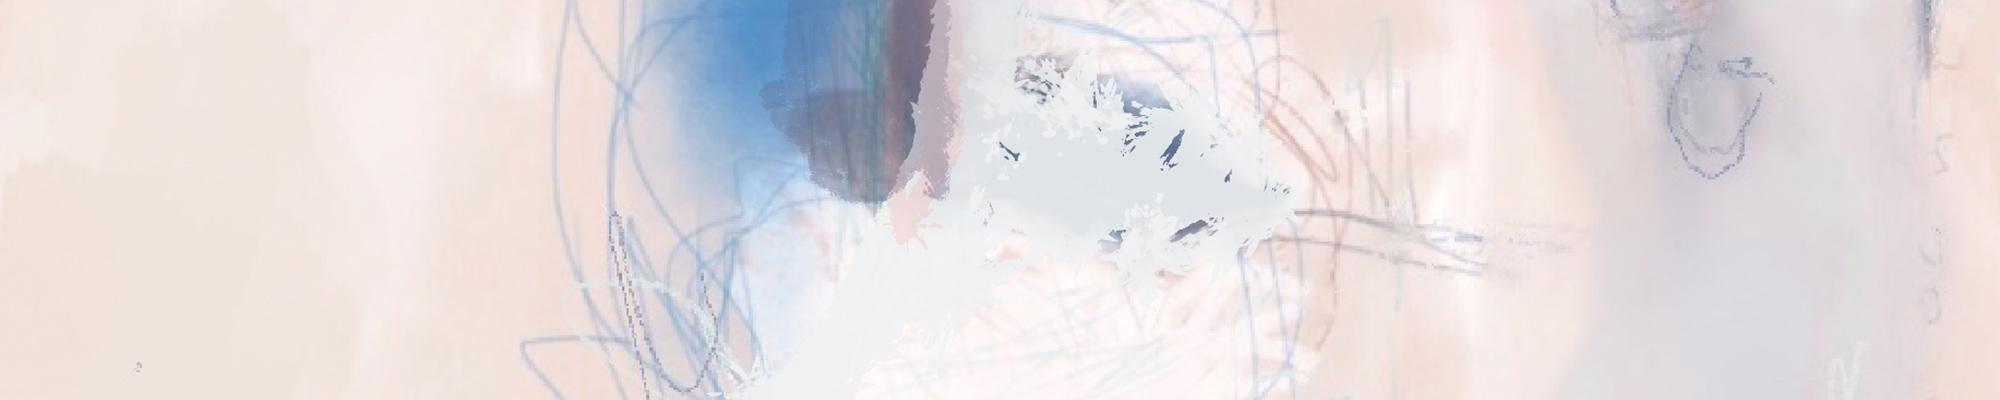 De val van Icarus © Anne-Riet de Boer [slide]